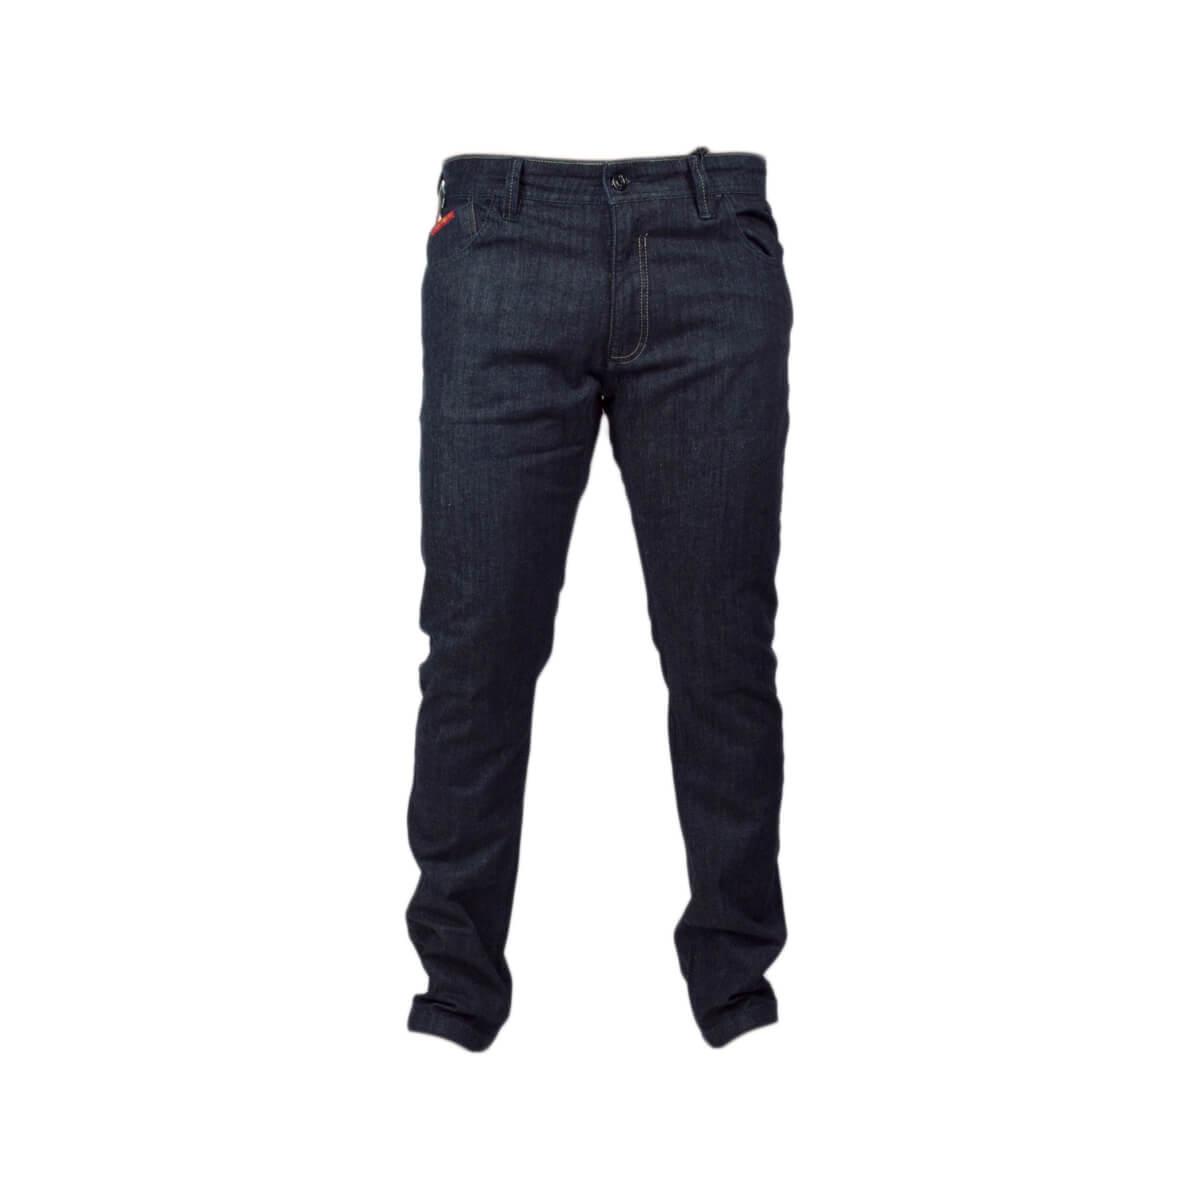 Imagem - Calça Jeans Lost Label  - 2.8691